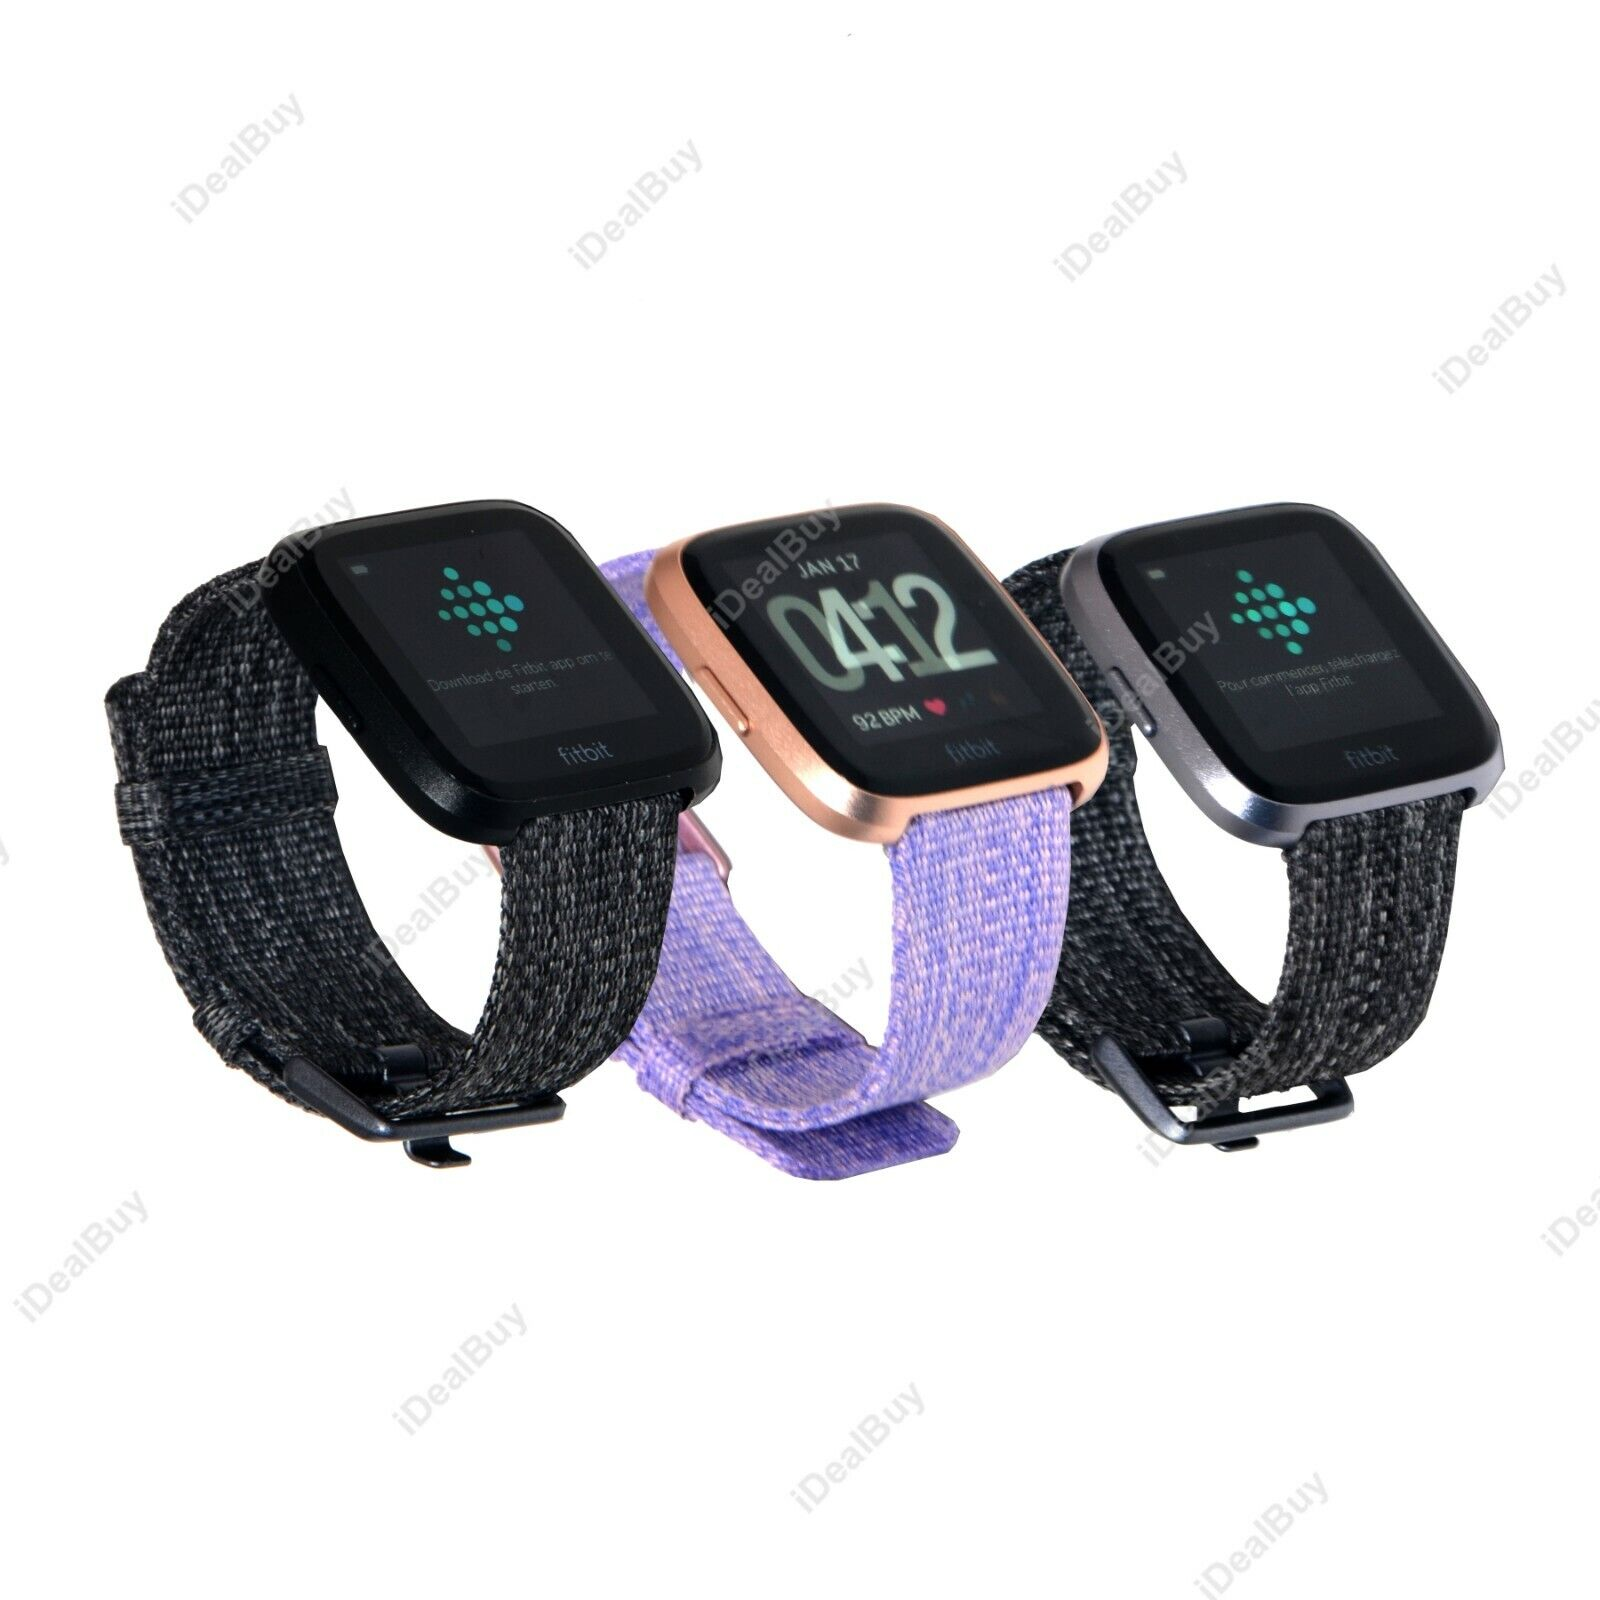 versa fb505 smart watch special edition fitness